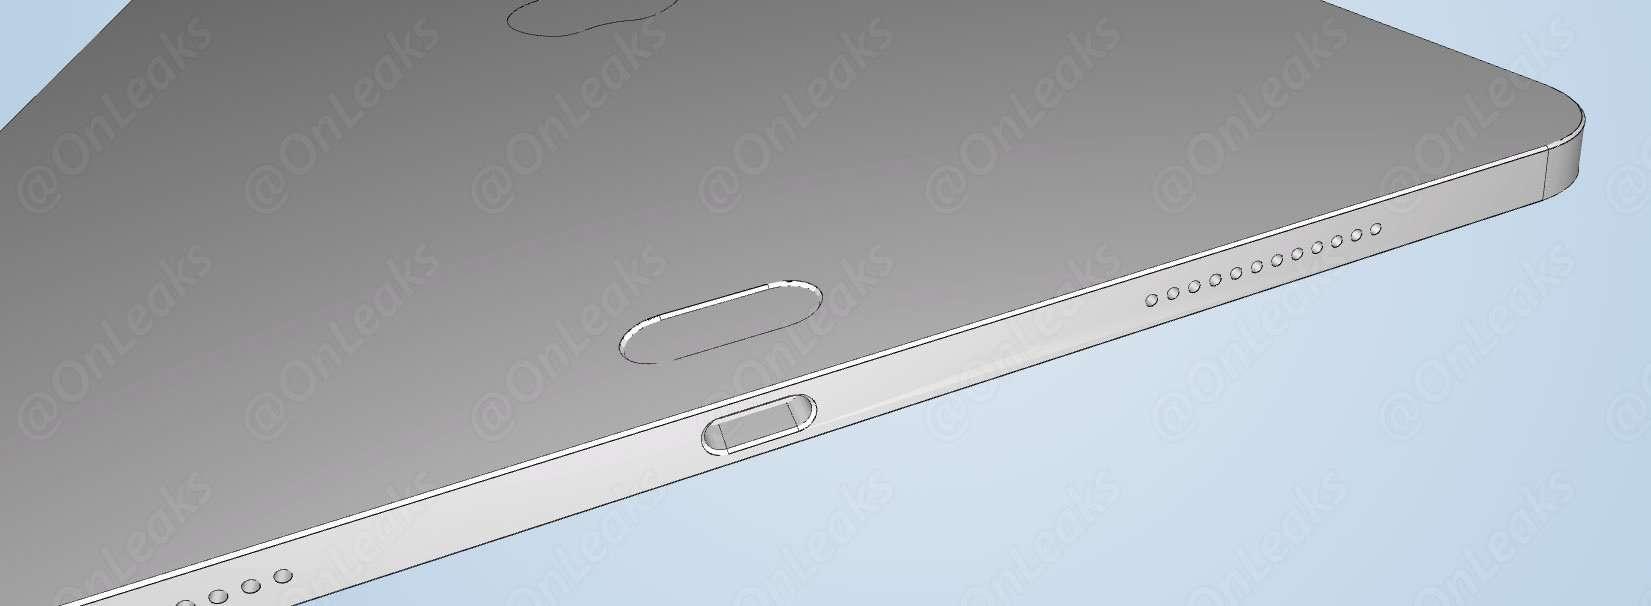 Leaked 2018 iPad Pro schematics